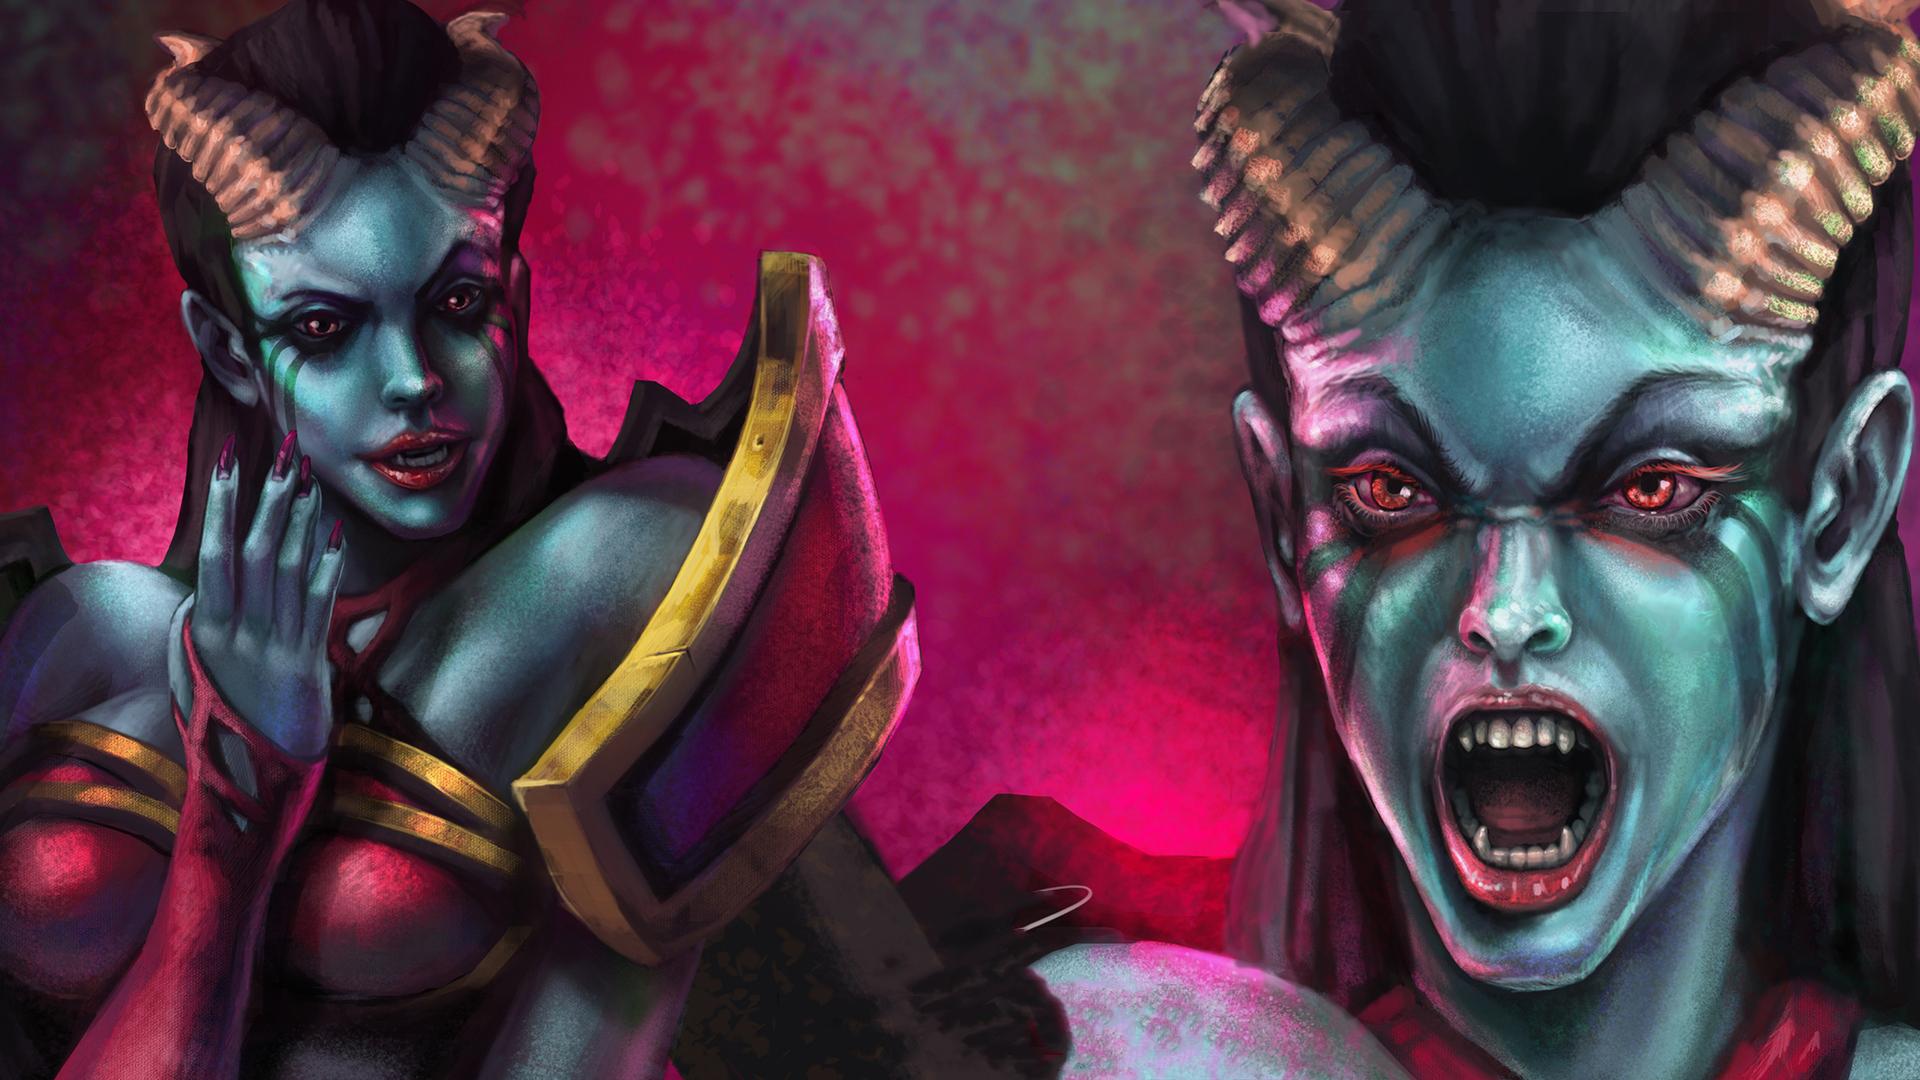 Images Dota 2 Queen Of Pain Demons Horns Face Girls 1920x1080